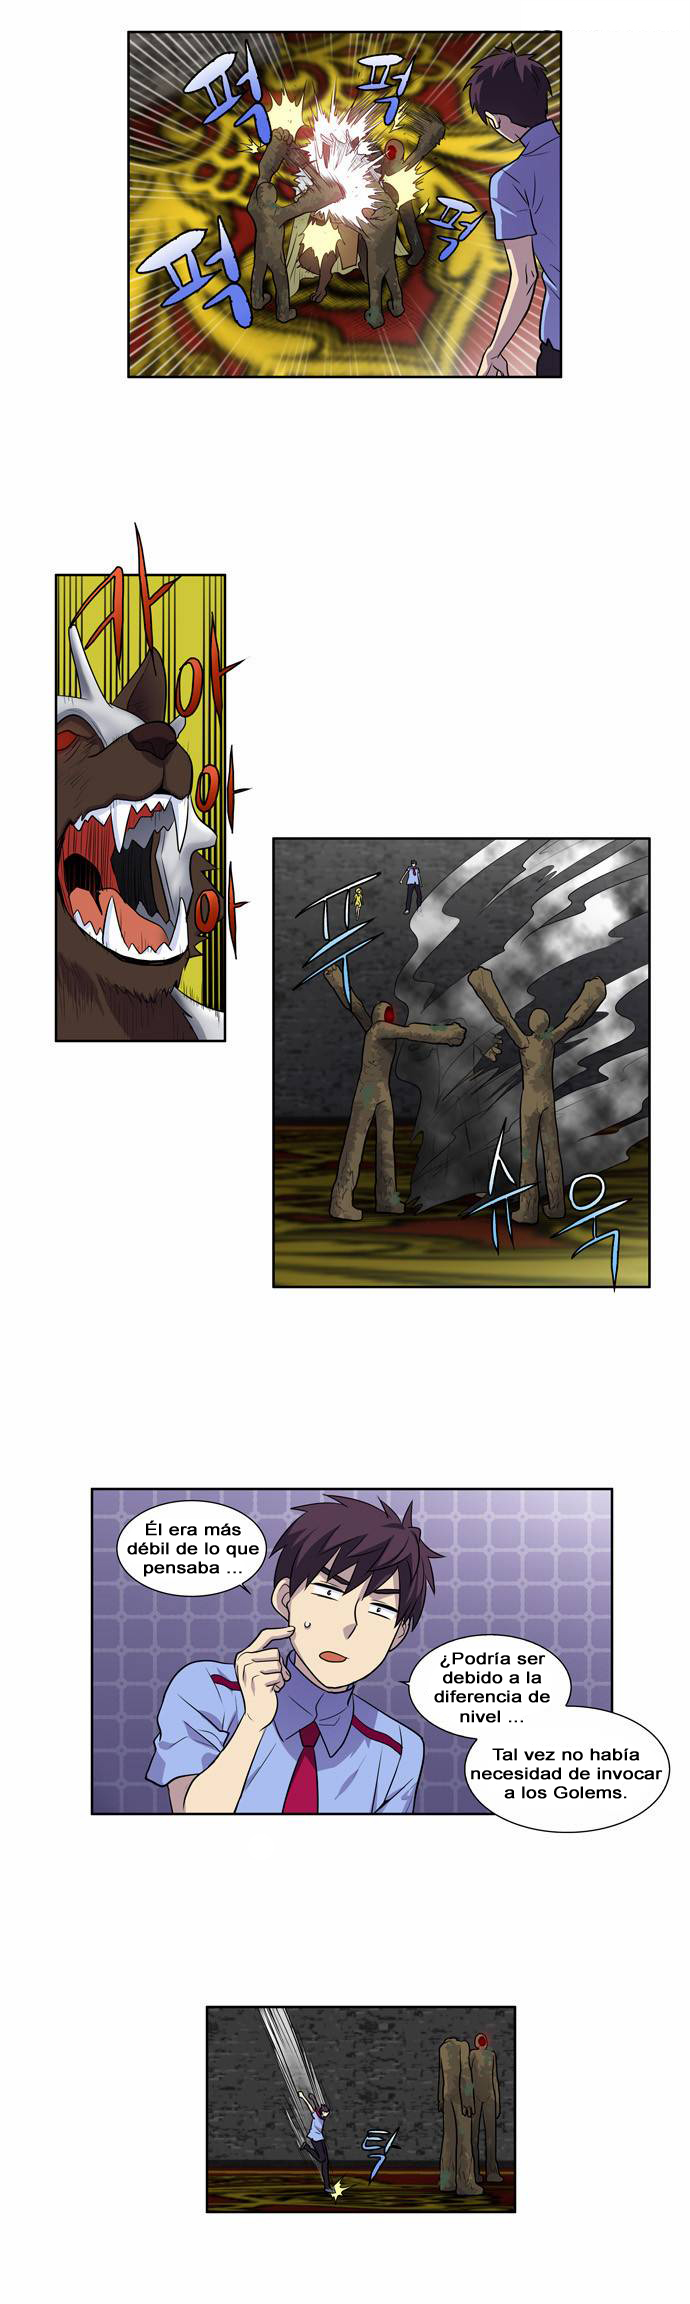 http://c5.ninemanga.com/es_manga/61/1725/396911/8f7552fdb6911a4fb5af7e4cd190bce8.jpg Page 10